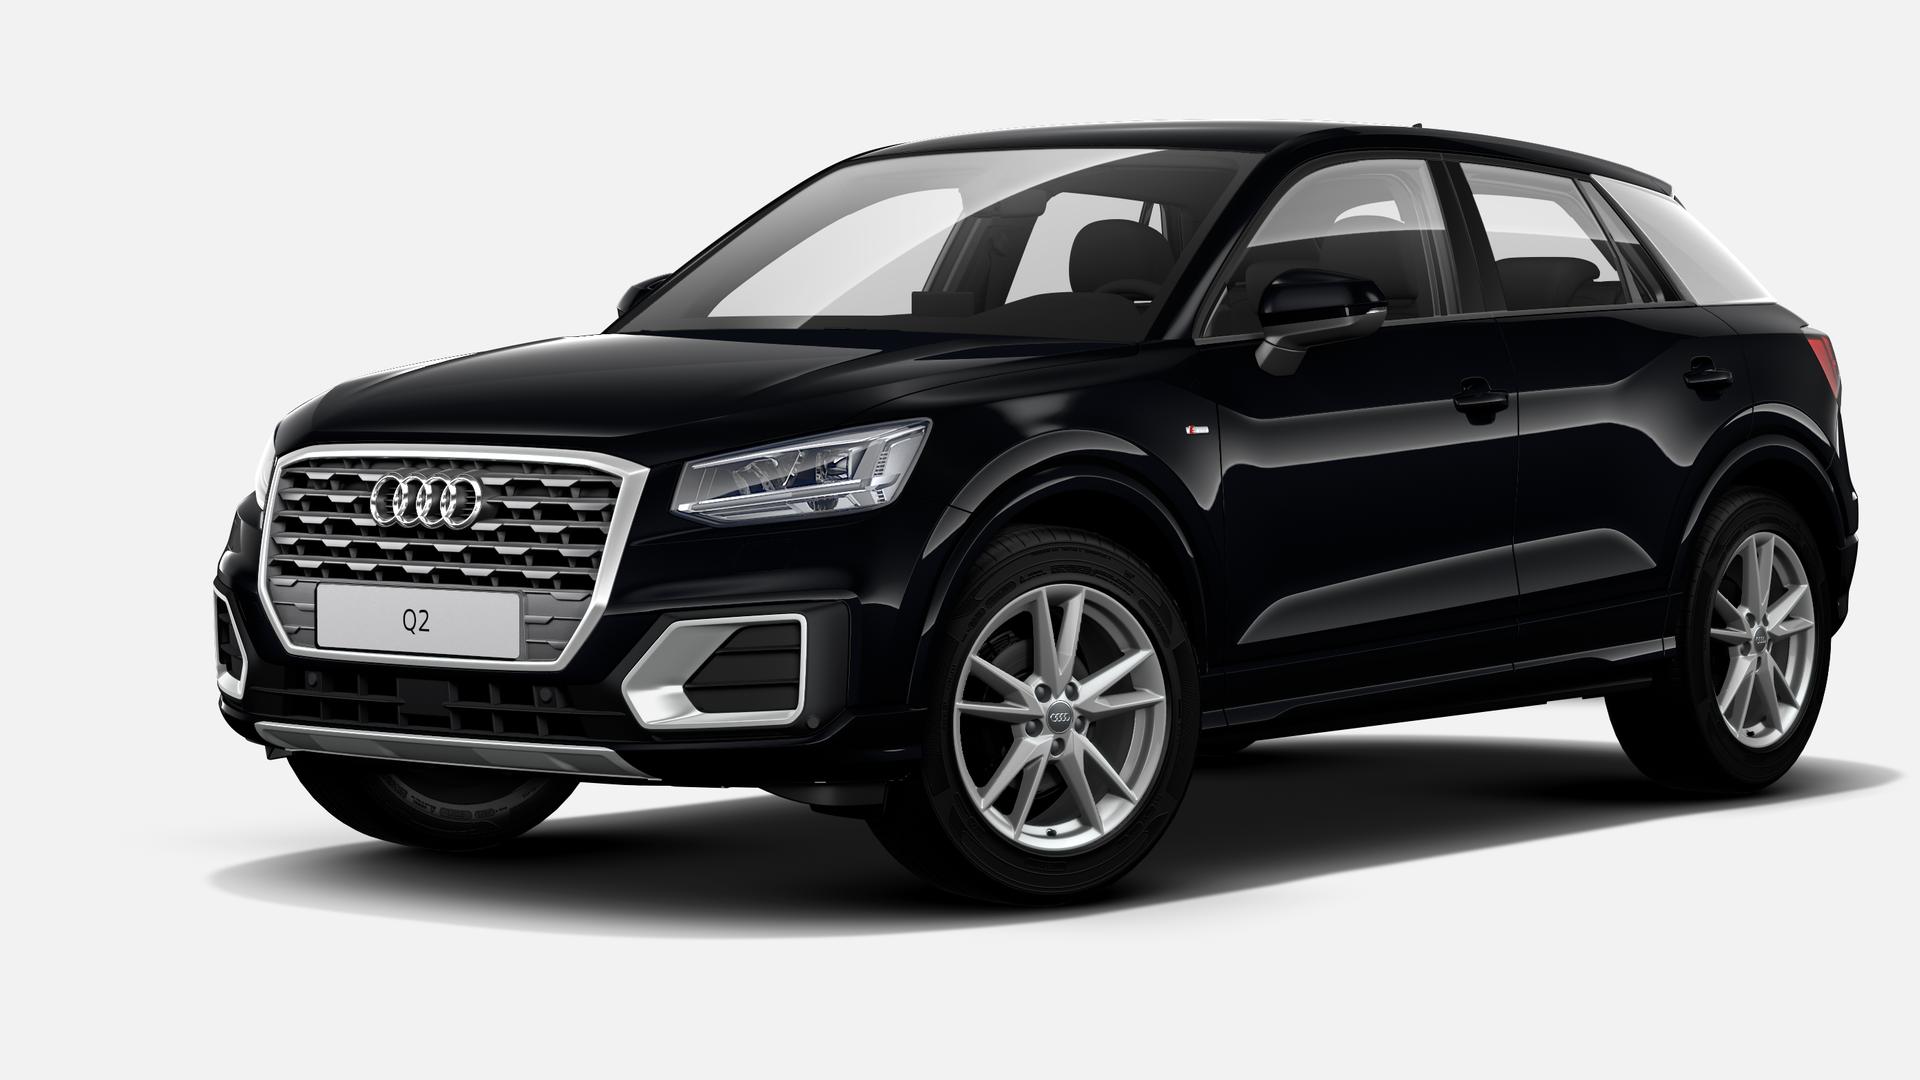 Audi Q2 30 TDI Design 85 kW (116 CV)  nuevo en Lugo